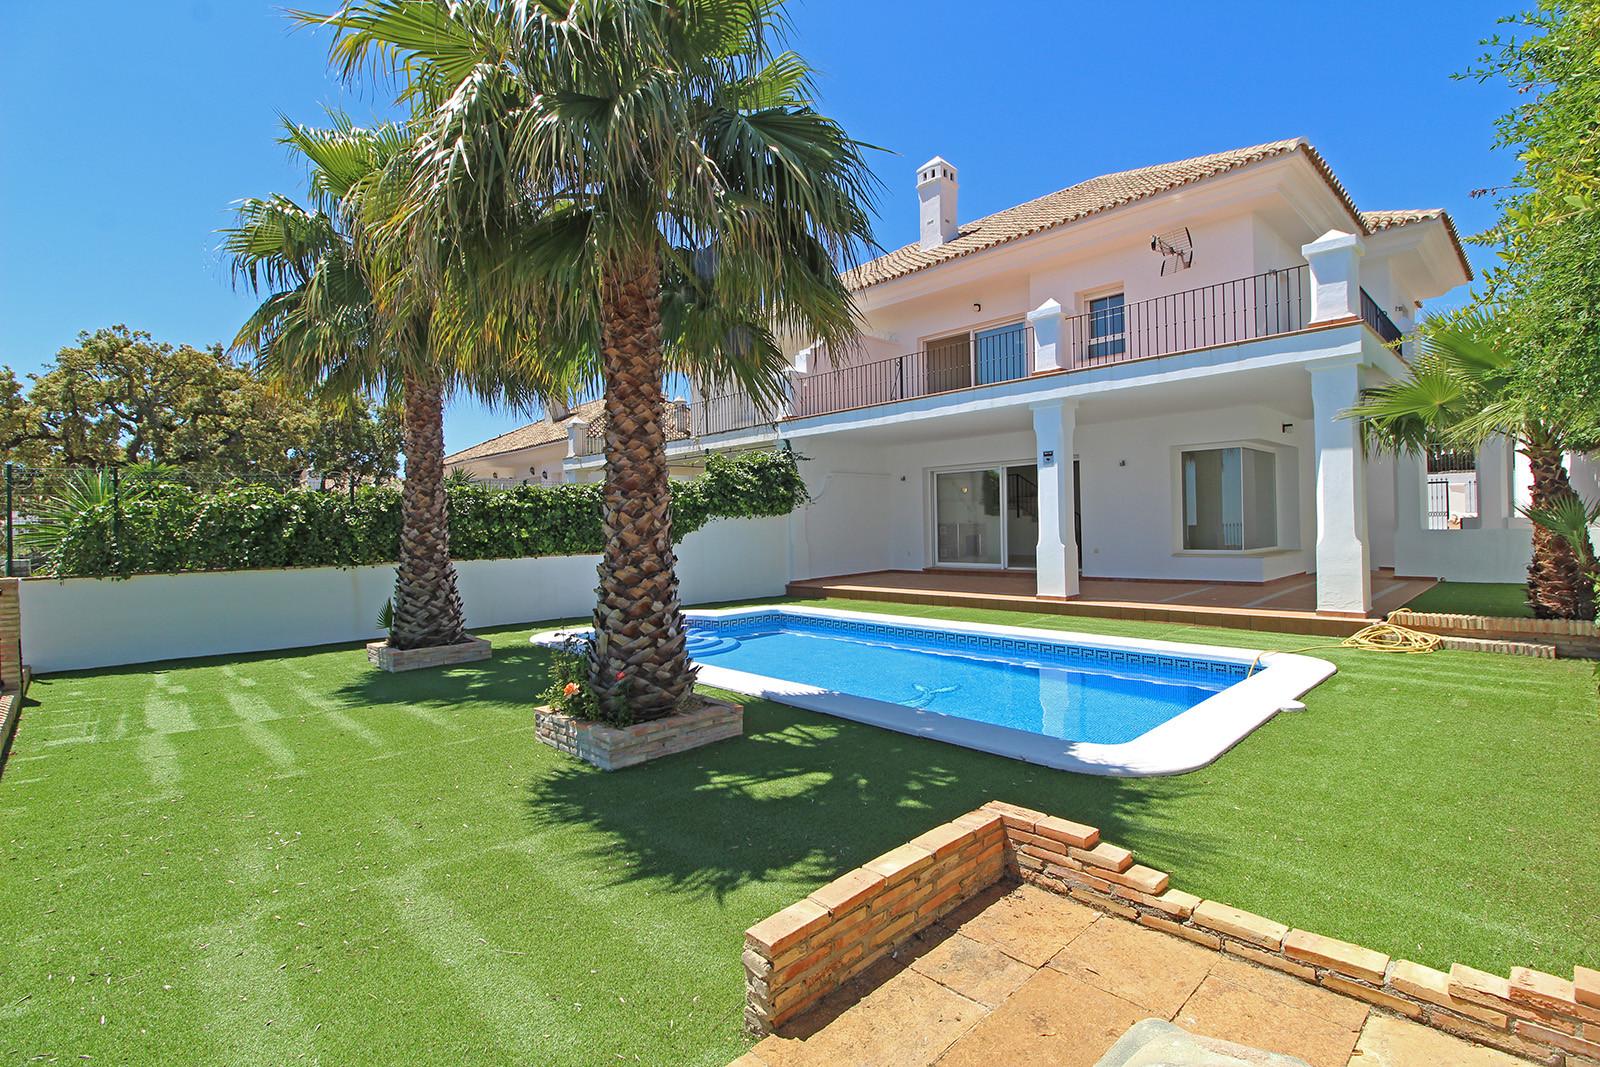 ARFV2095 - Doppelhaushälfte mit Panoramablick zum Verkauf in La Mairena in Ojen, Marbella